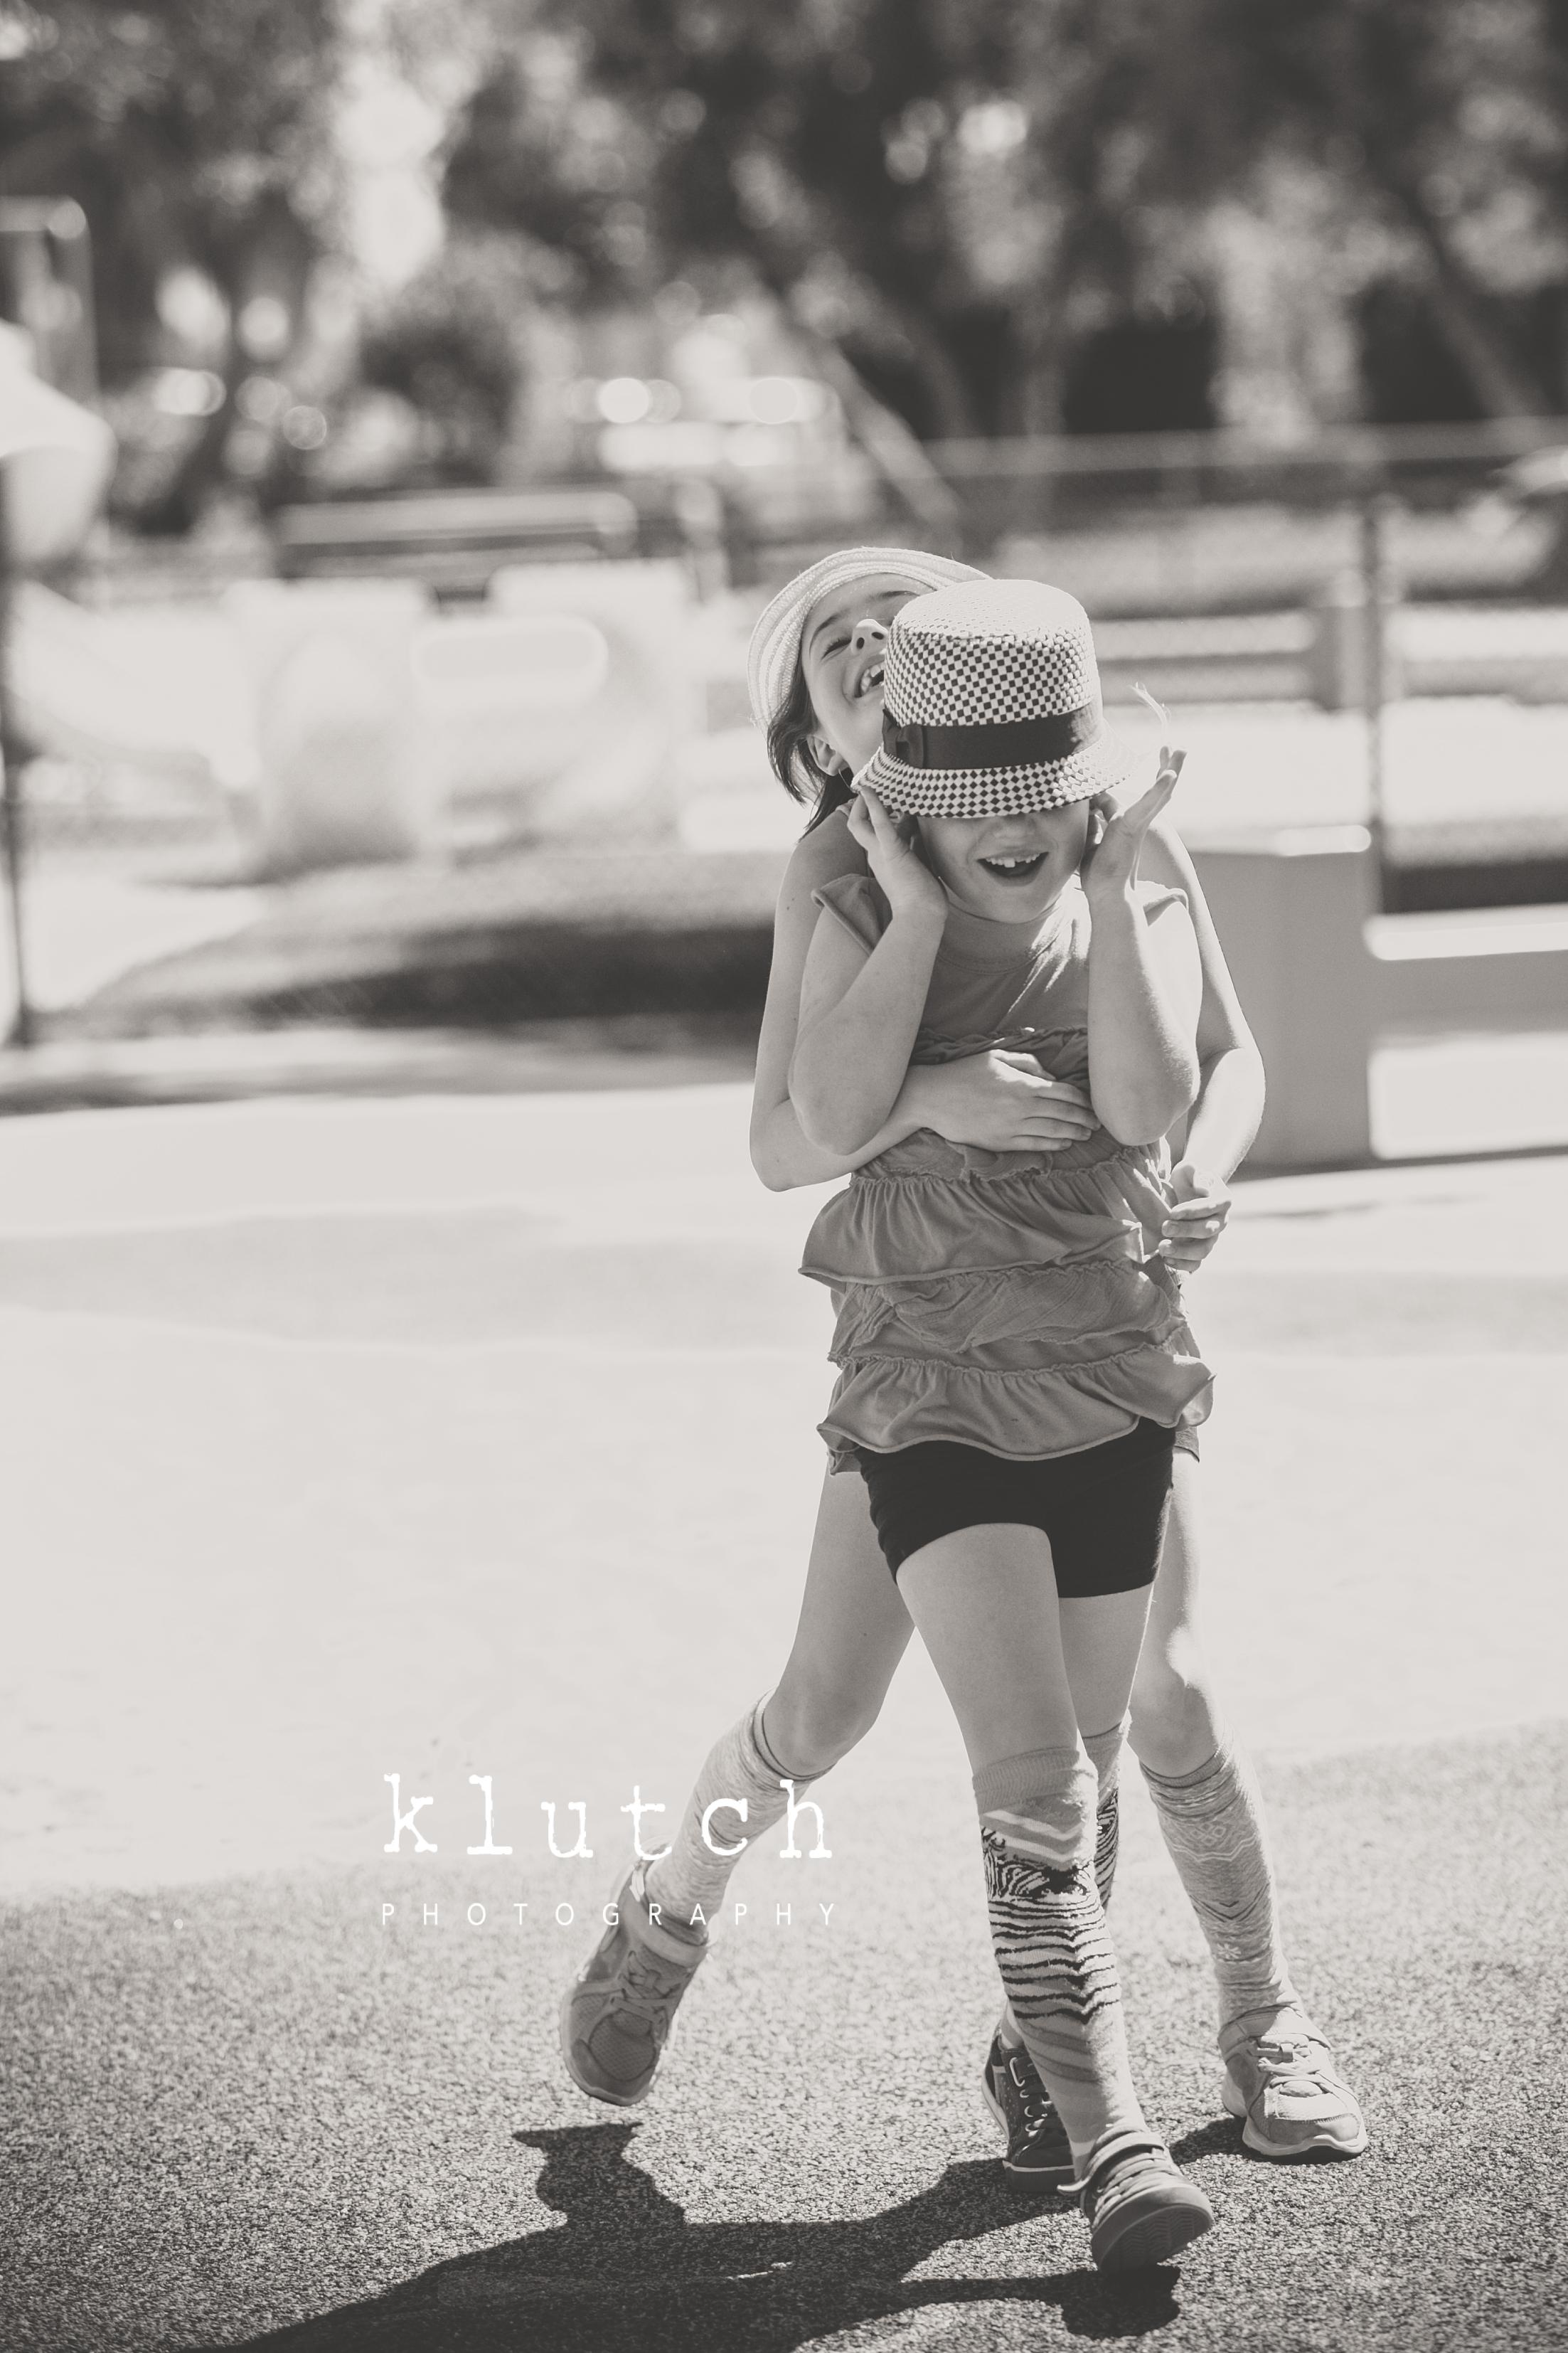 Klutch Photography,white rock family photographer, vancouver family photographer, whiterock lifestyle photographer, life unscripted photographer, life unscripted session, photography,Dina Ferreira Stoddard-0146.jpg